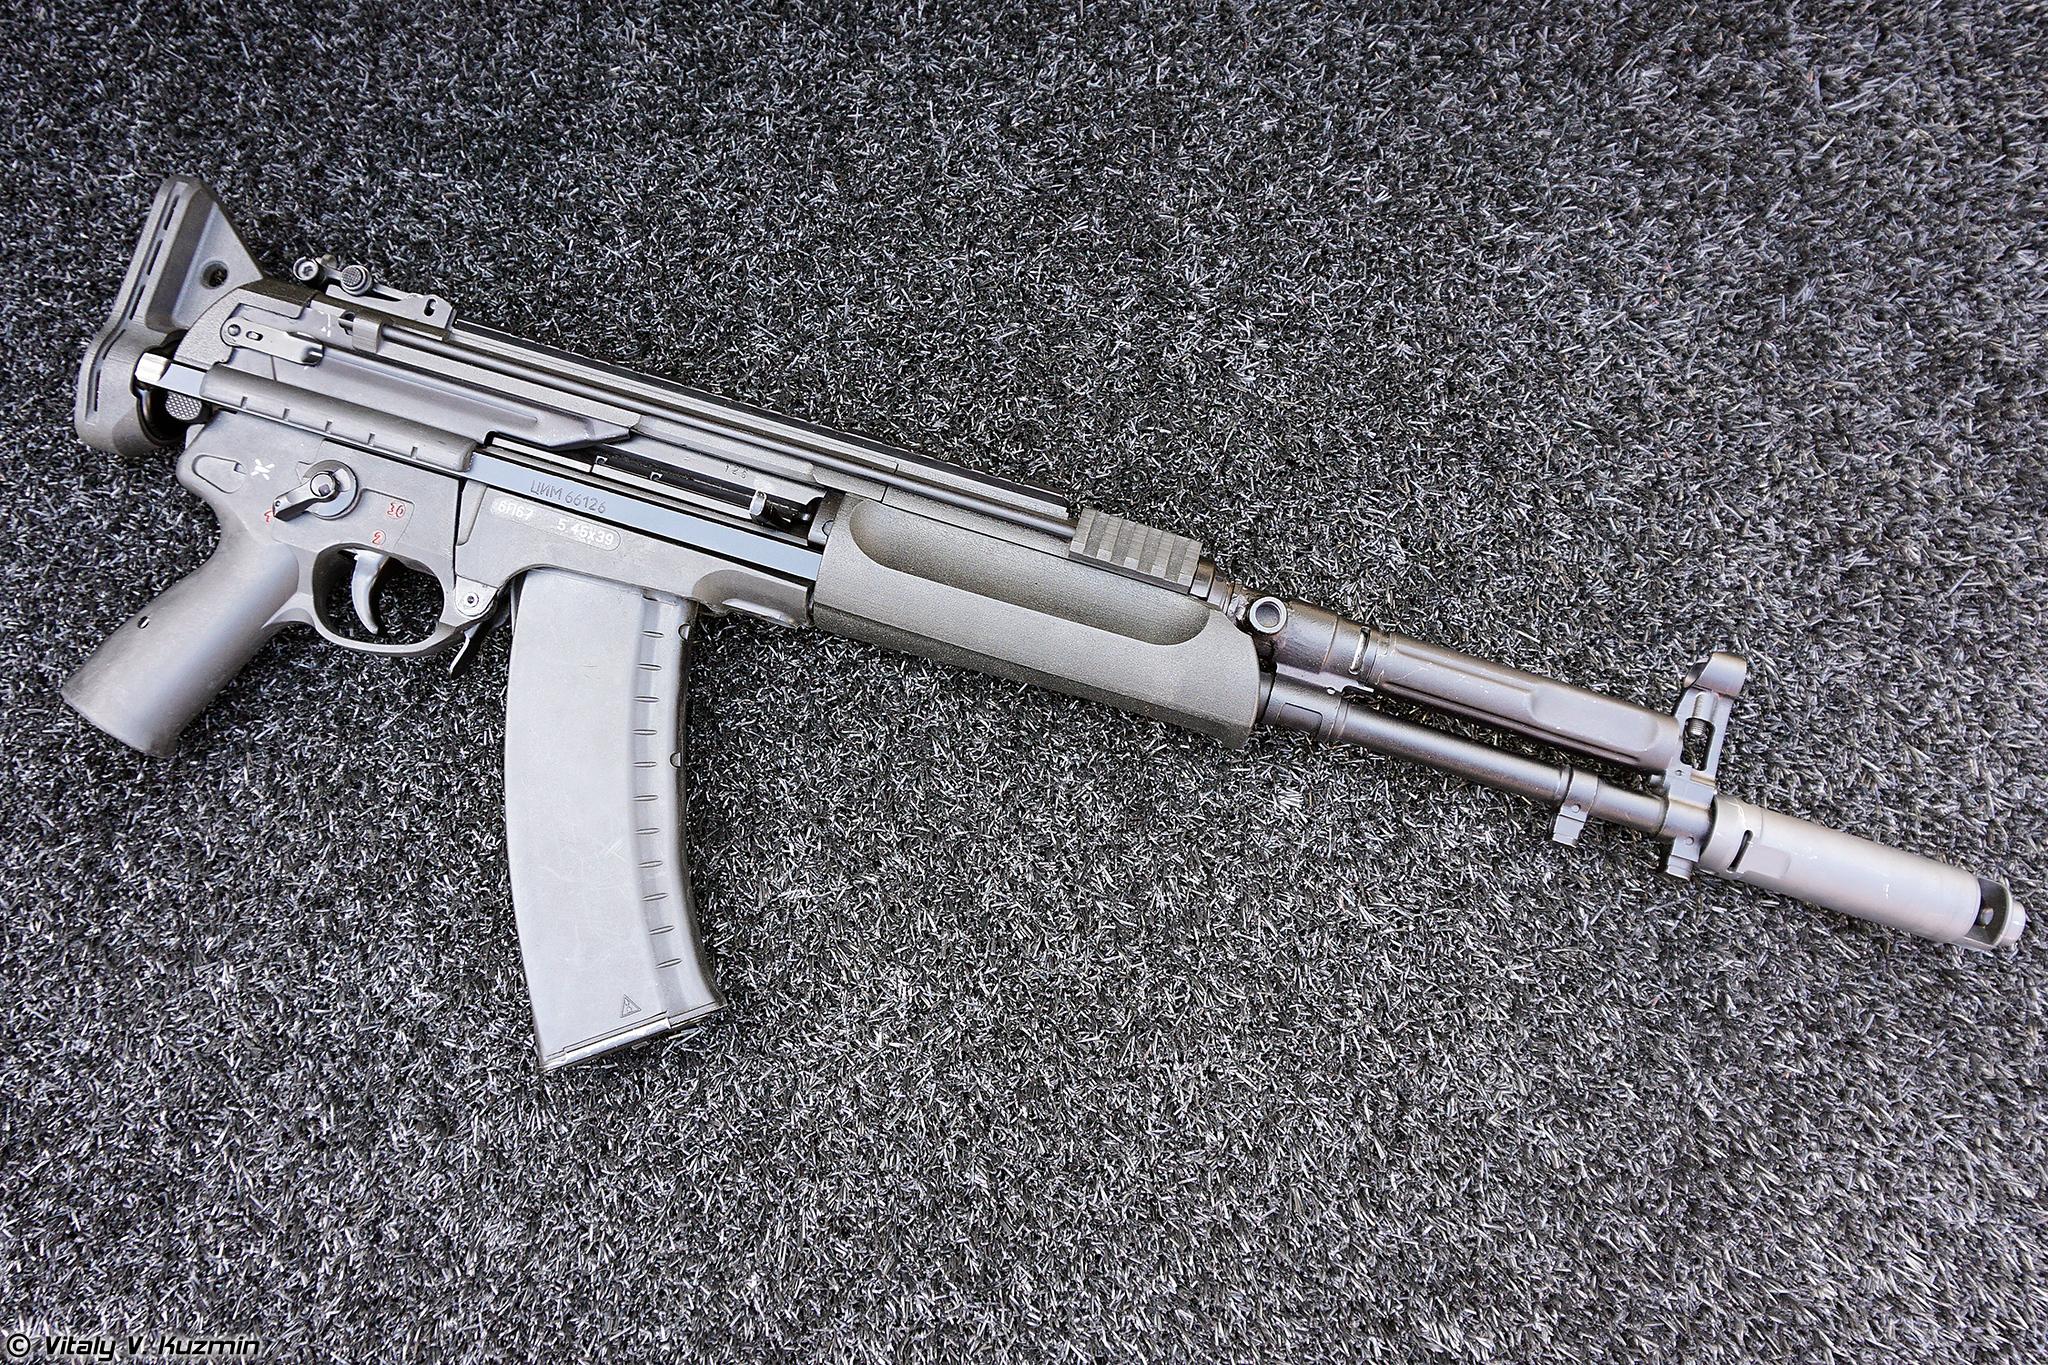 Russian Assault Rifles/Carbines/Machine Guns Thread: #2 - Page 10 Army-2020-Pavilions-025-X4